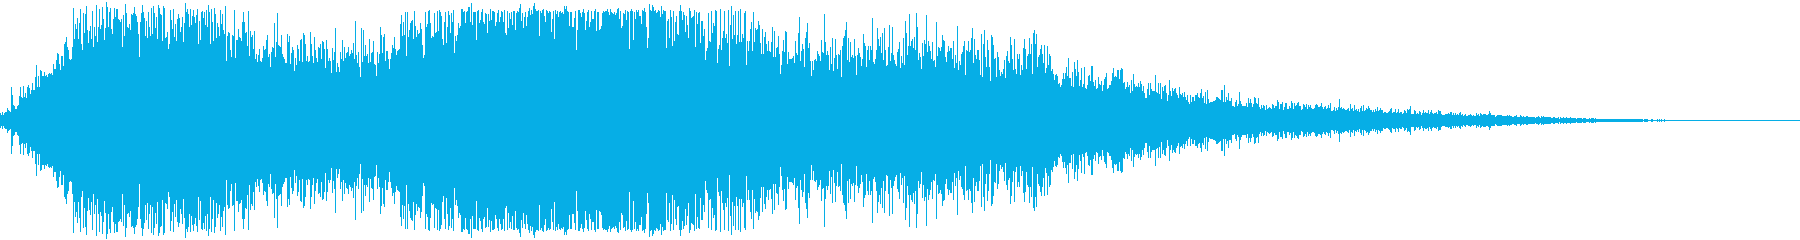 CINEMATICなROGOに...05の再生済みの波形